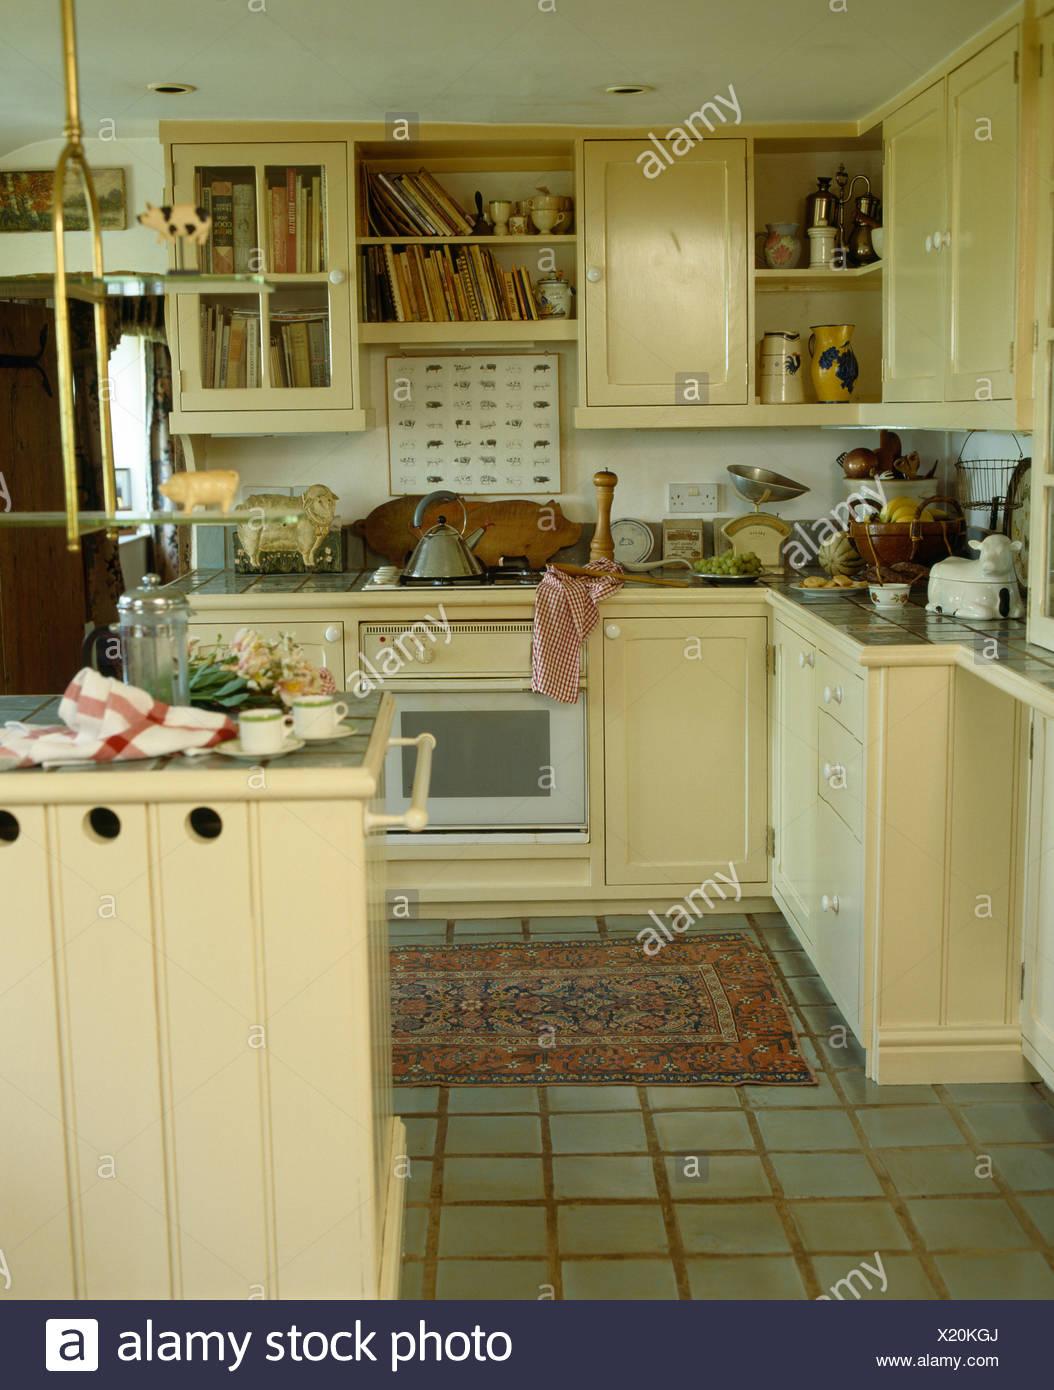 Interiors Traditional Cream Kitchens Stock Photos & Interiors ...